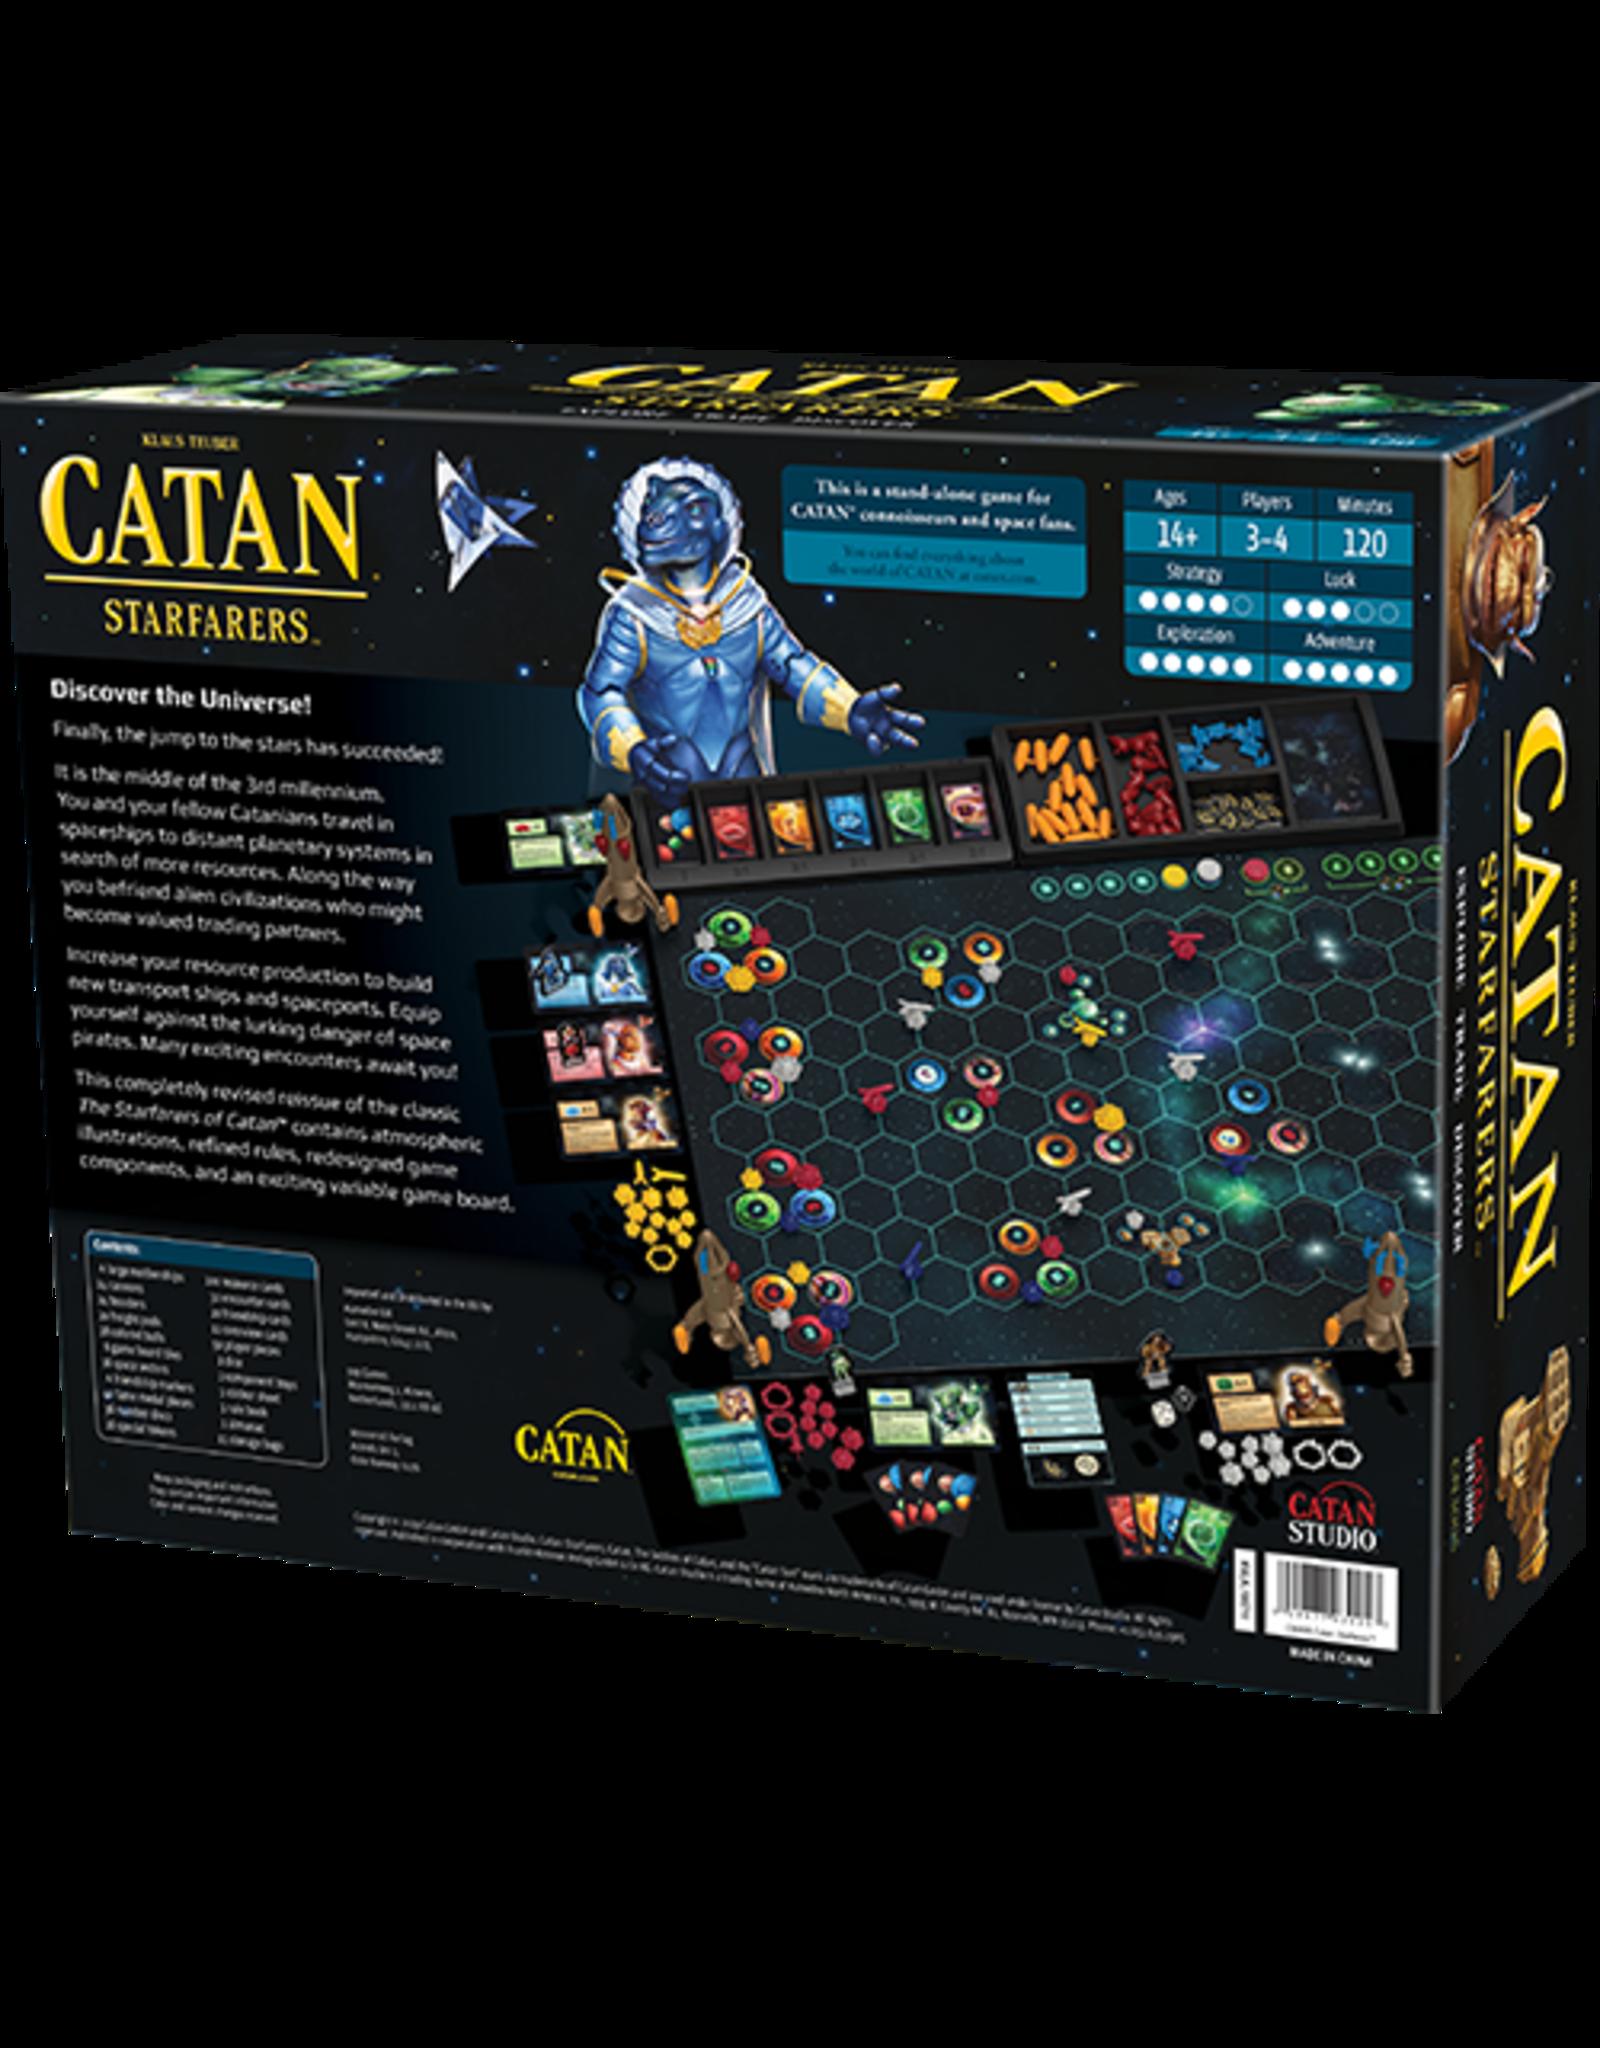 Catan Studios Starfarers Catan 2nd Ed. (Core Set)